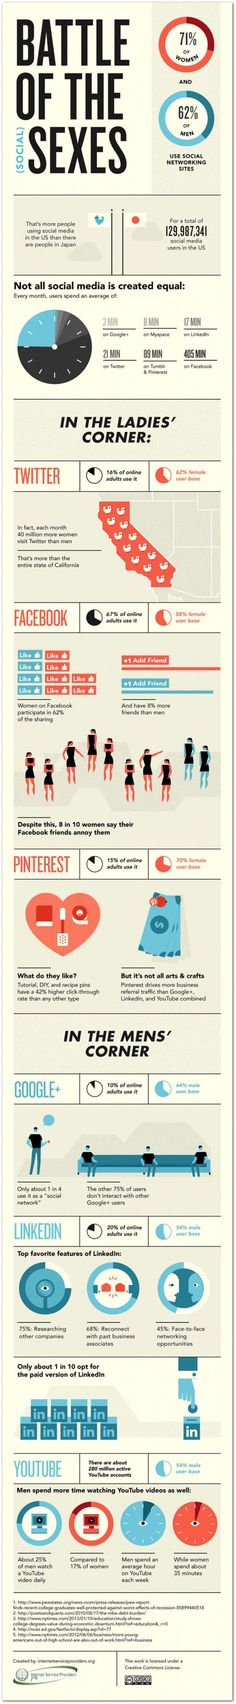 Battle of the sexes: infographic mannen-vs-vrouwen on social media Inbound Marketing, Marketing Digital, Content Marketing, Internet Marketing, Online Marketing, Social Media Marketing, Social Web, Social Trends, Info Board